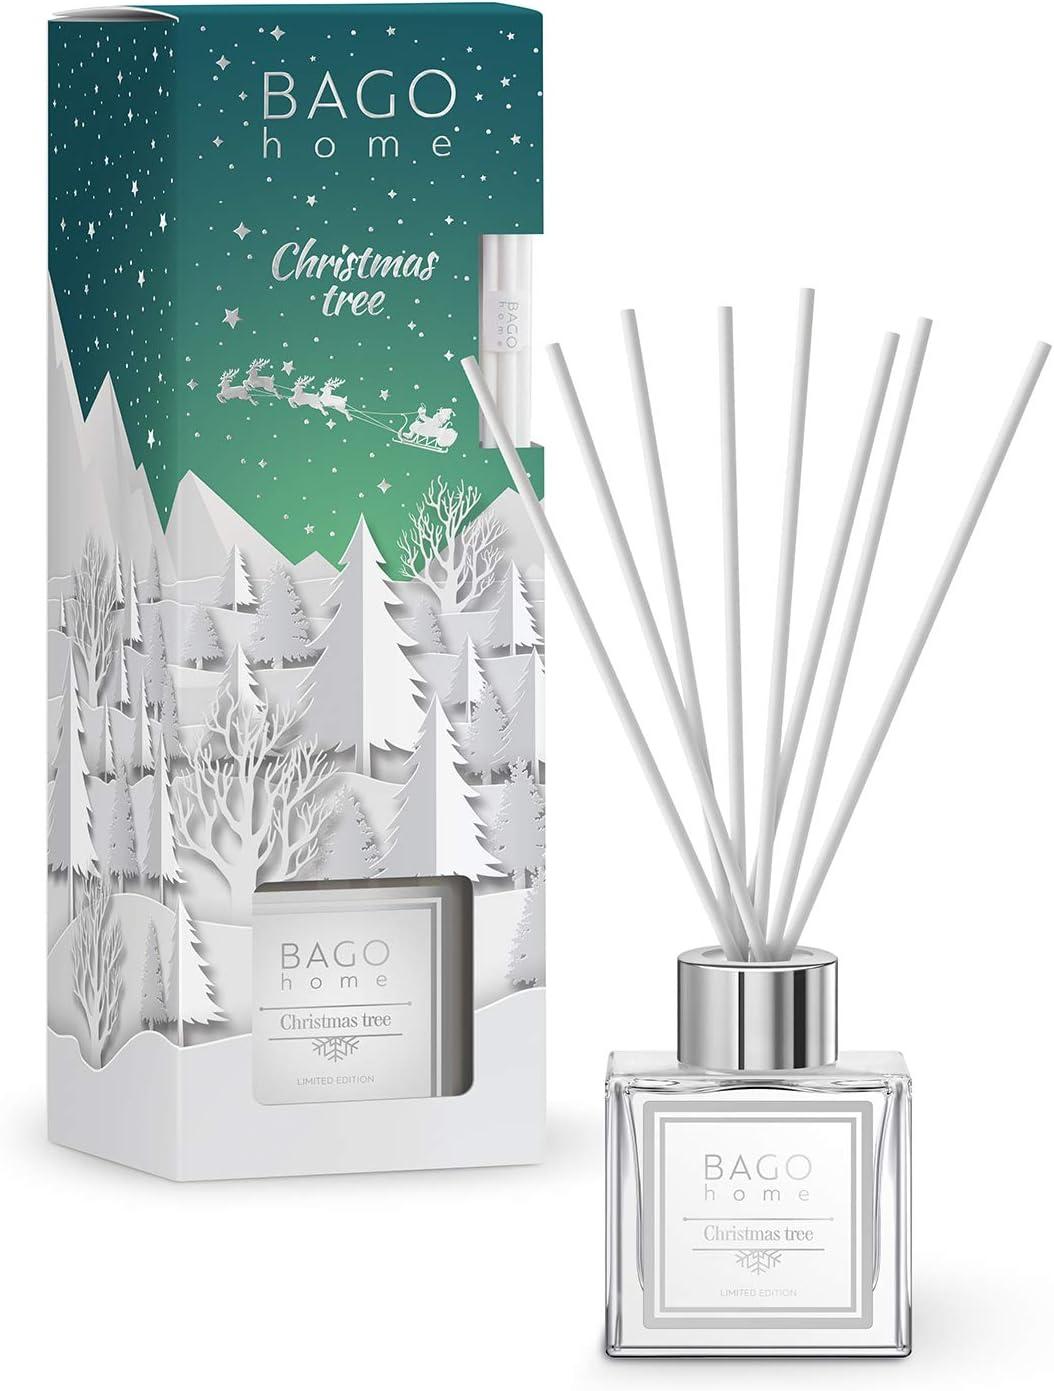 BAGO home Christmas Collection Oil Diffuser New life Reed - Omaha Mall Set